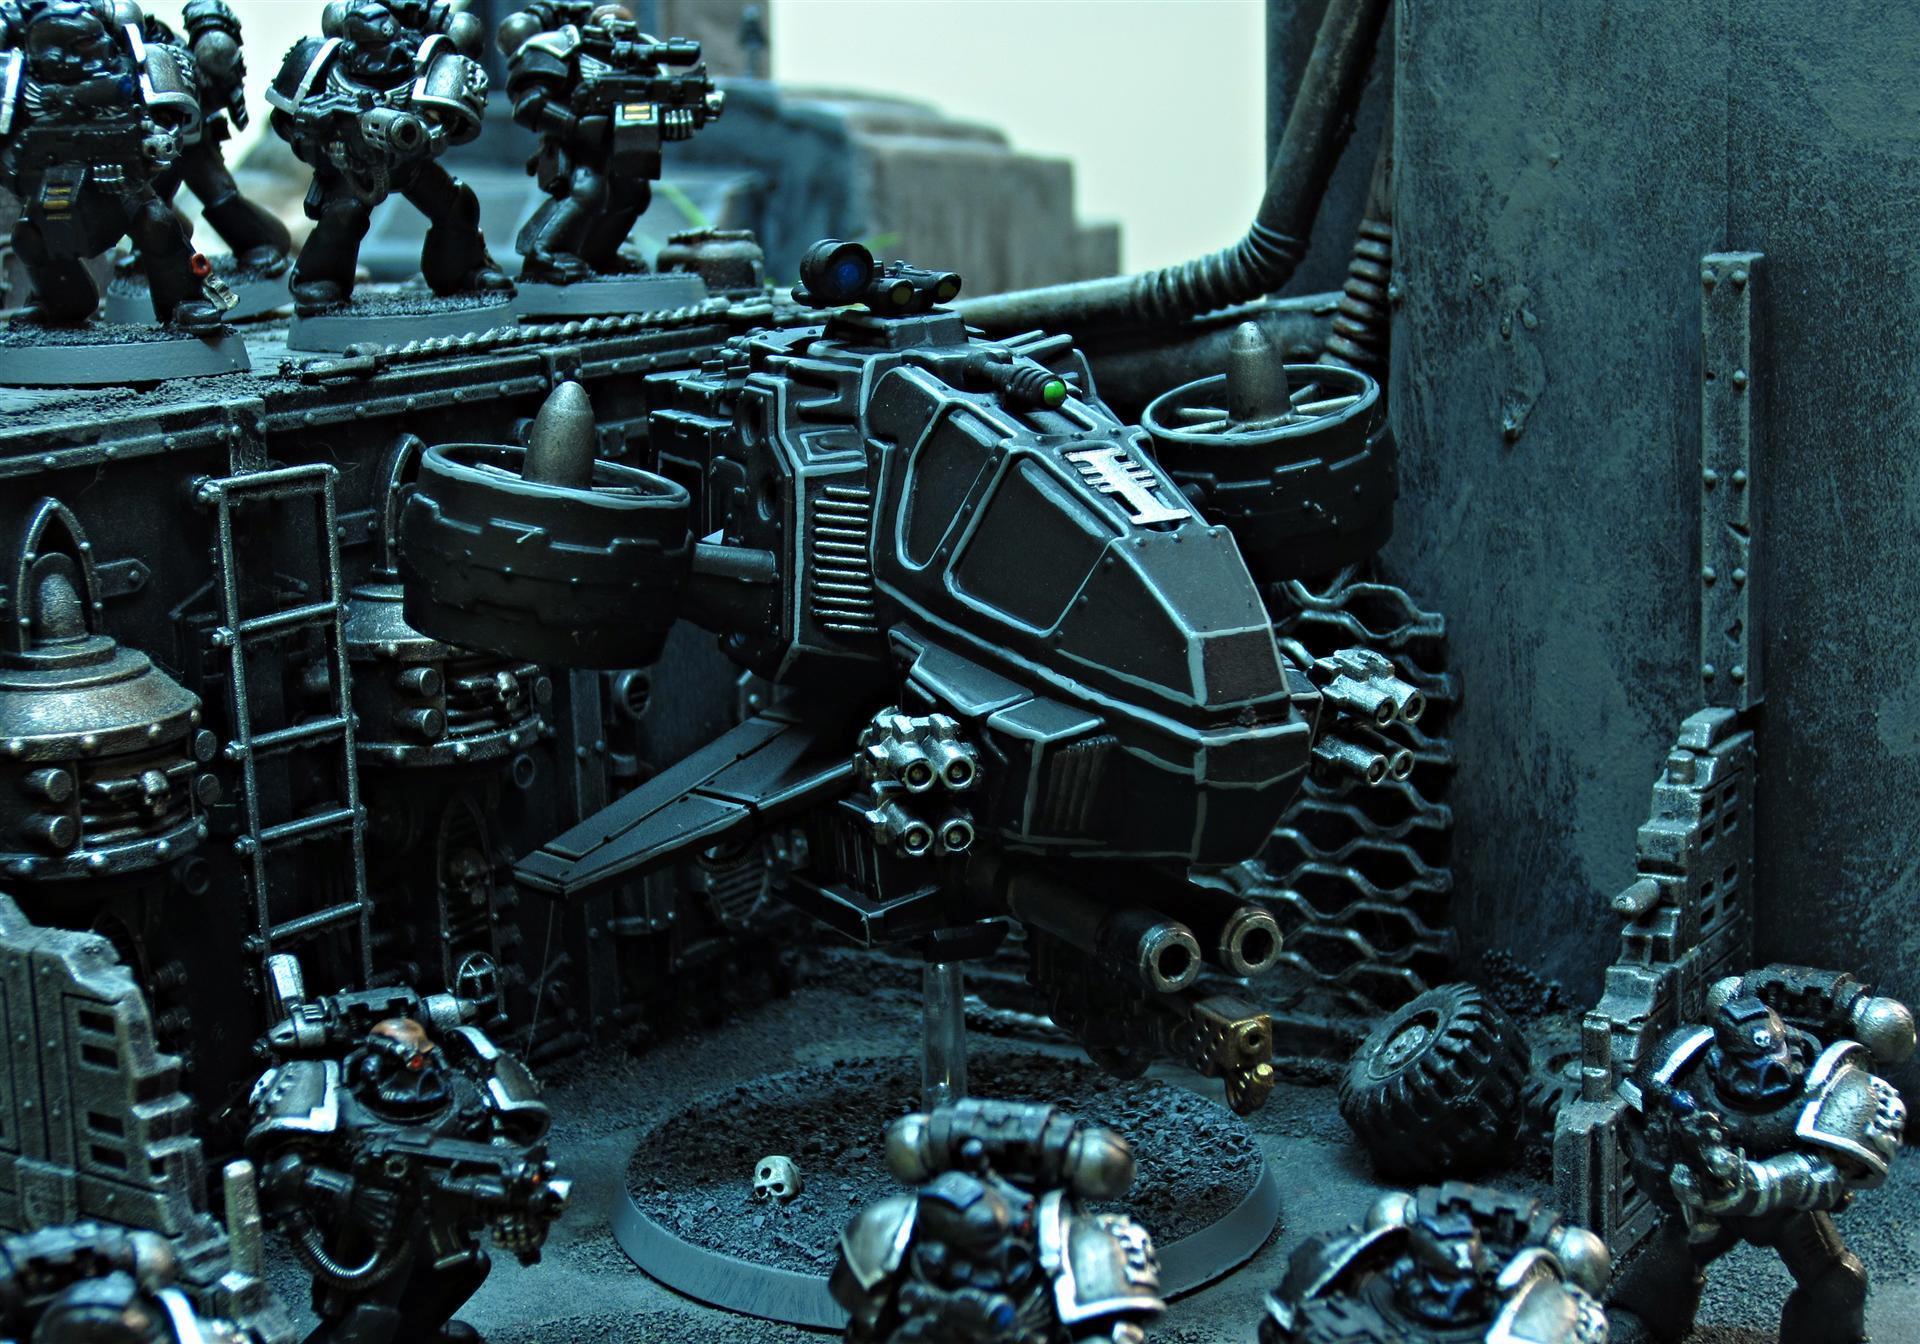 Alien Hunter, Alien Hunters, Black Shield, Black Shields, Blackshields, Count As Plague Drone, Death Watch, Deathwatch, Inquisition, Inquisitor, Ordos Xenos, Ravenor